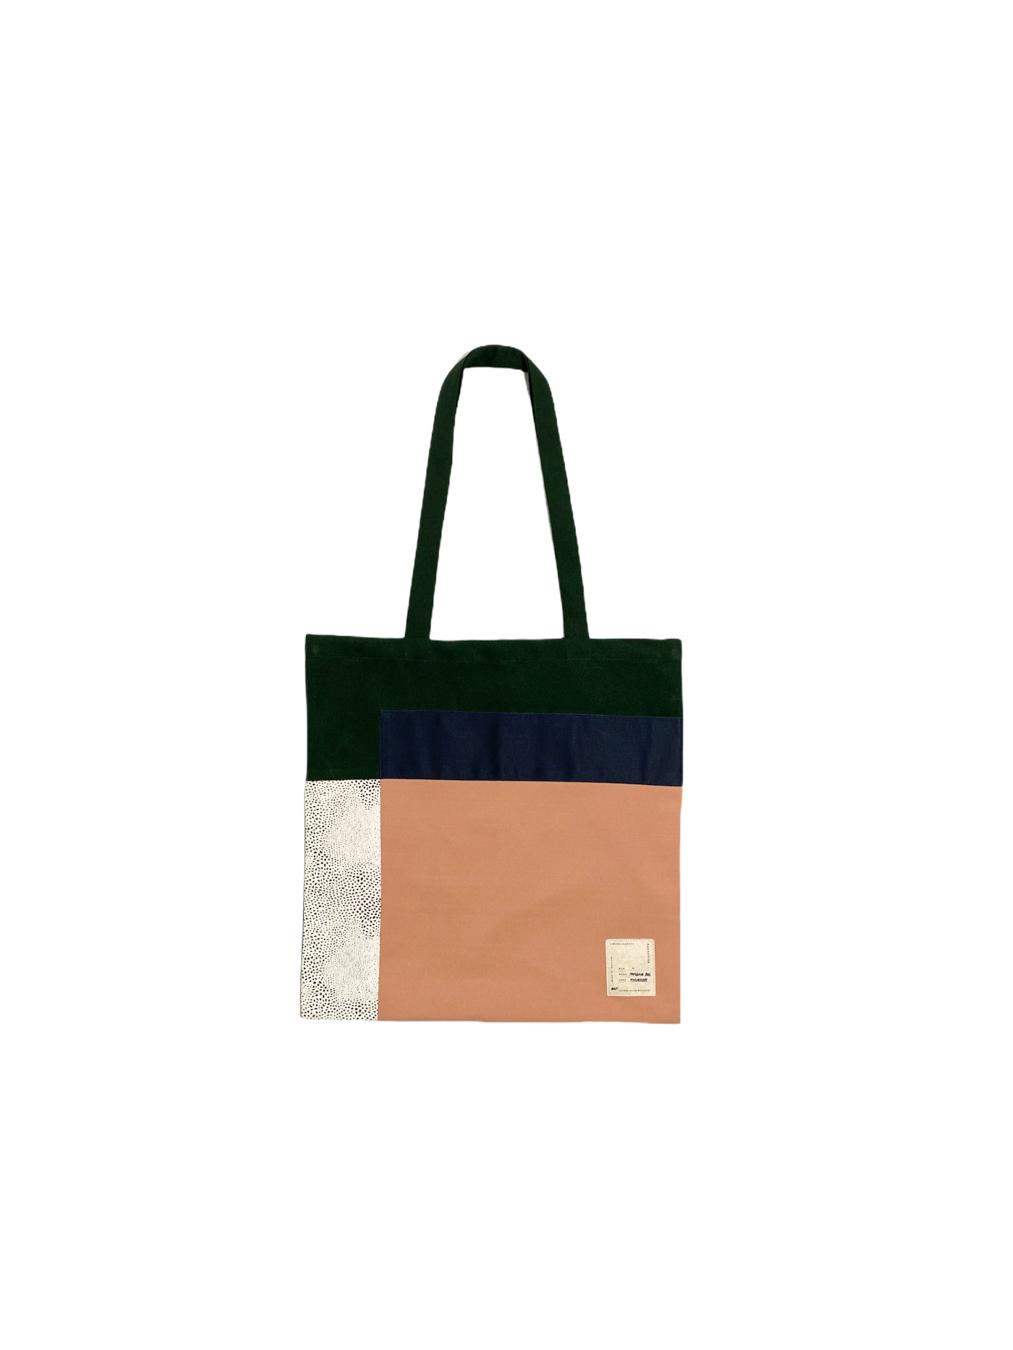 Mongkol  Tote Bag (Thursday)